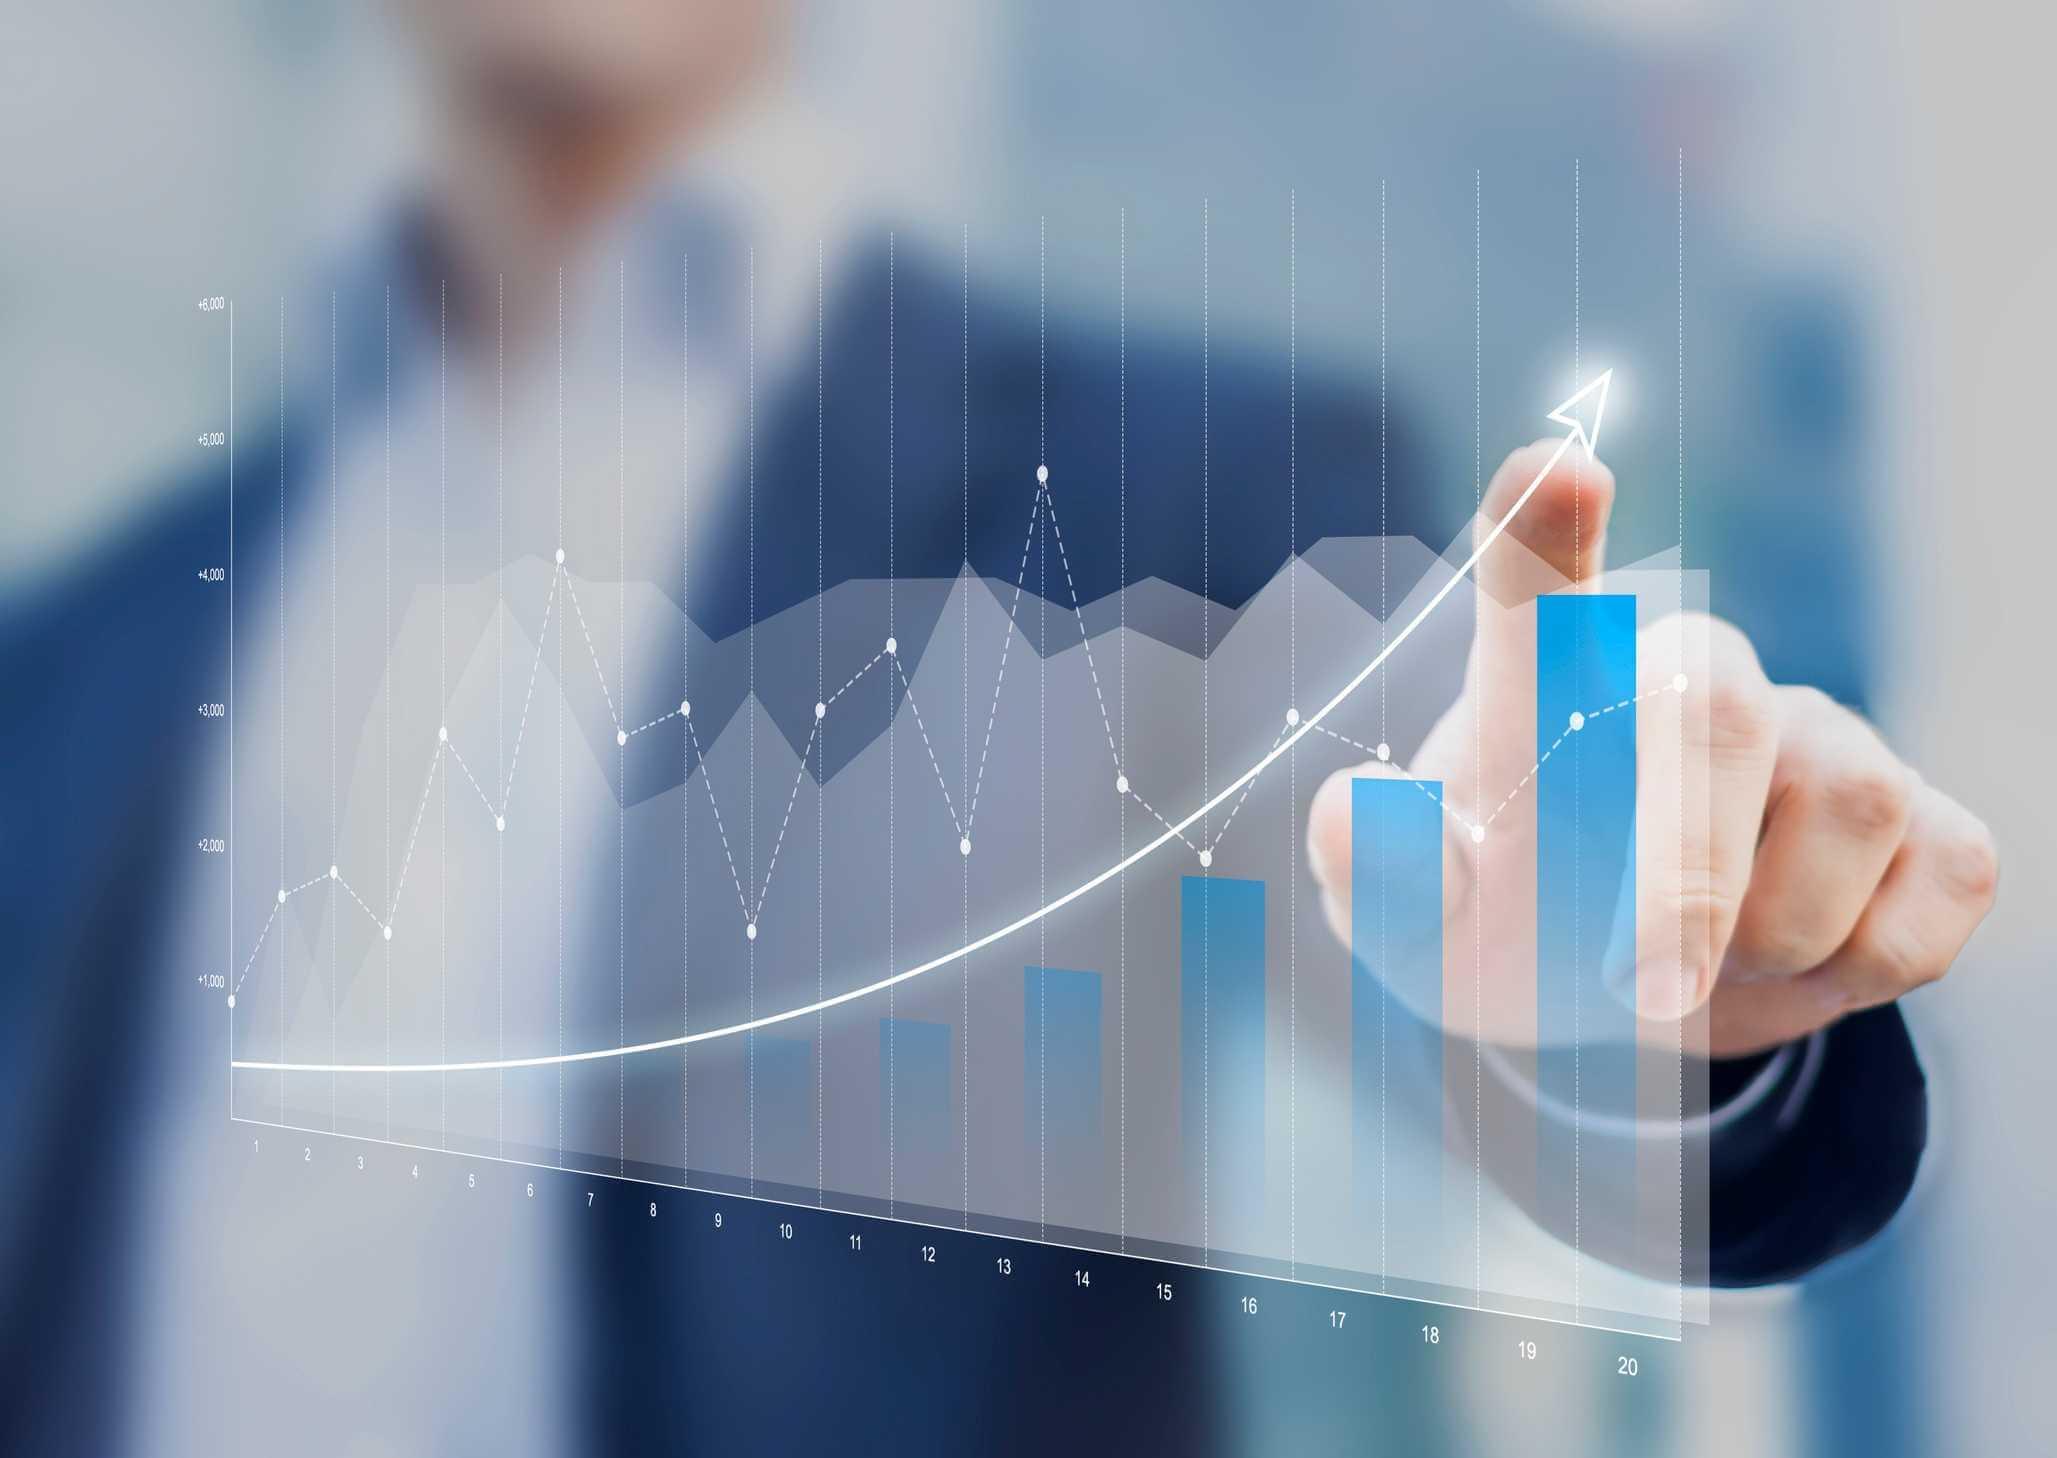 Understanding Revenue vs Customer Churn Rate